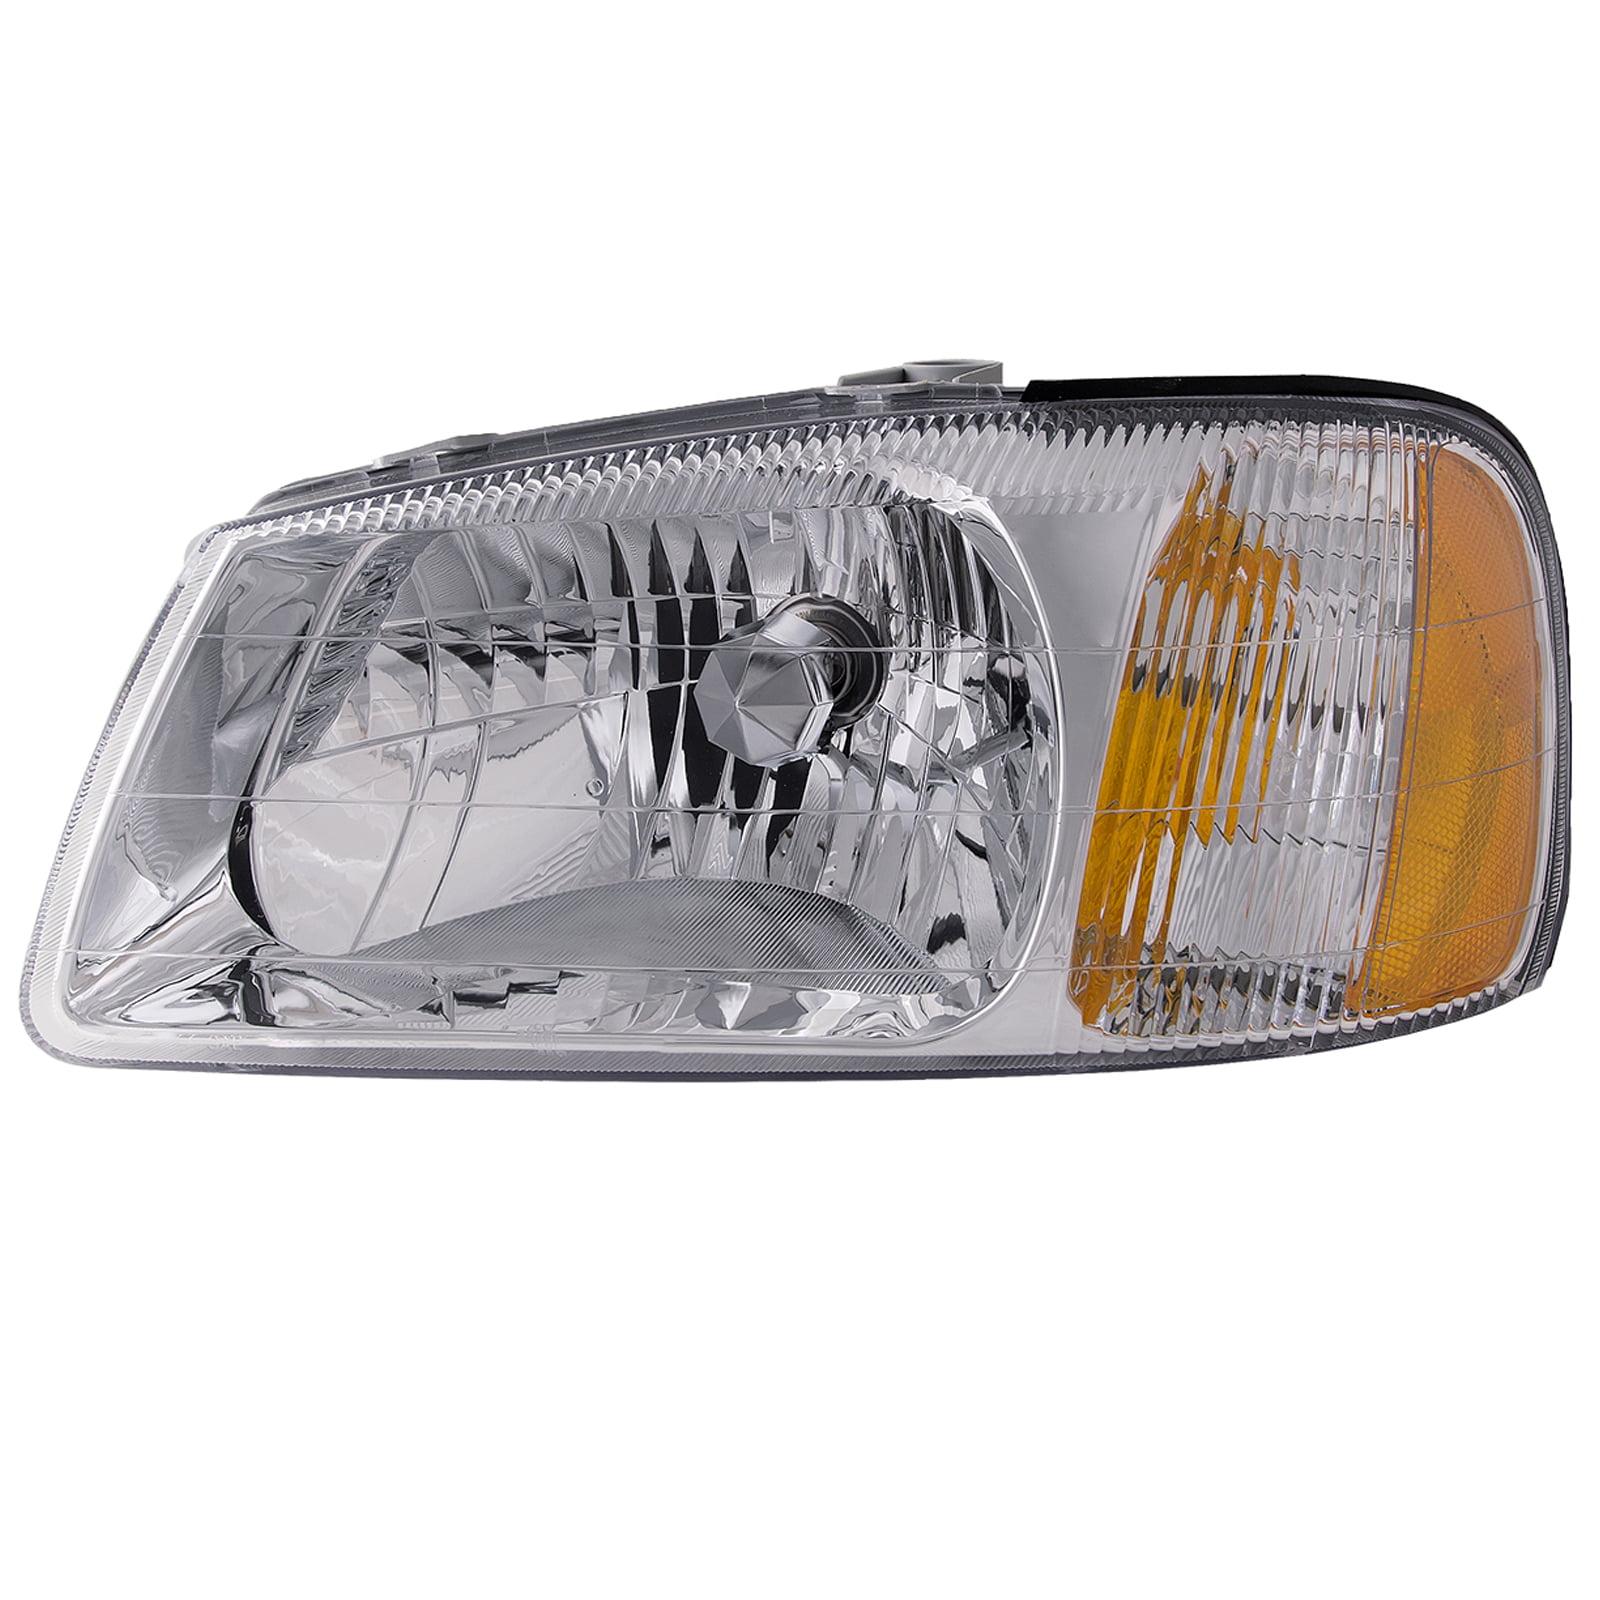 -Chrome 100W Halogen Driver side WITH install kit 6 inch 2014 Volvo VNL730 SLEEPER-POST Post mount spotlight